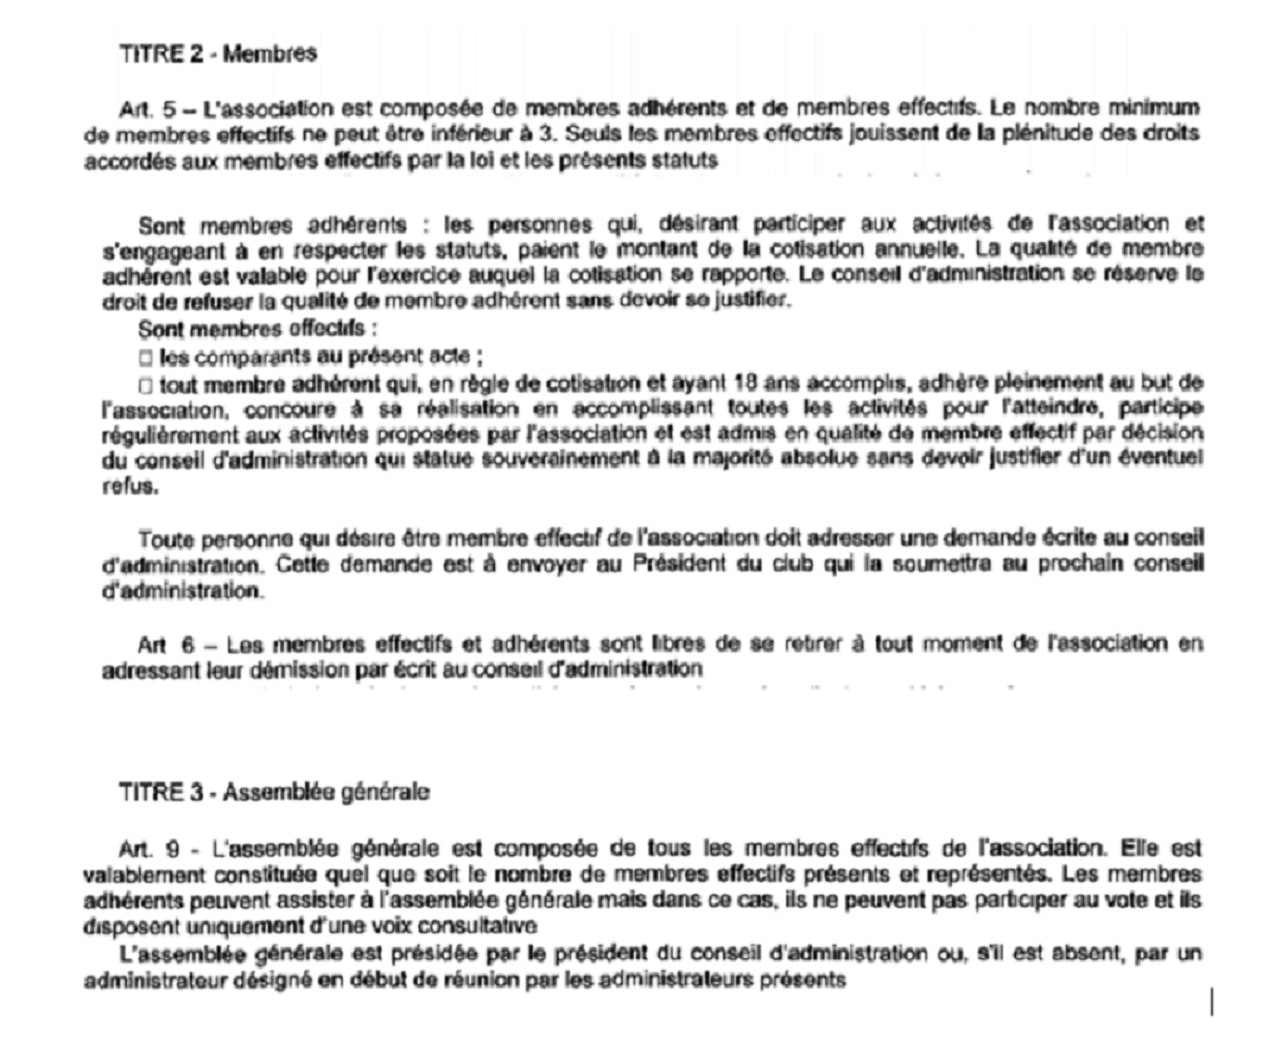 Statuts membres effectifs adherents